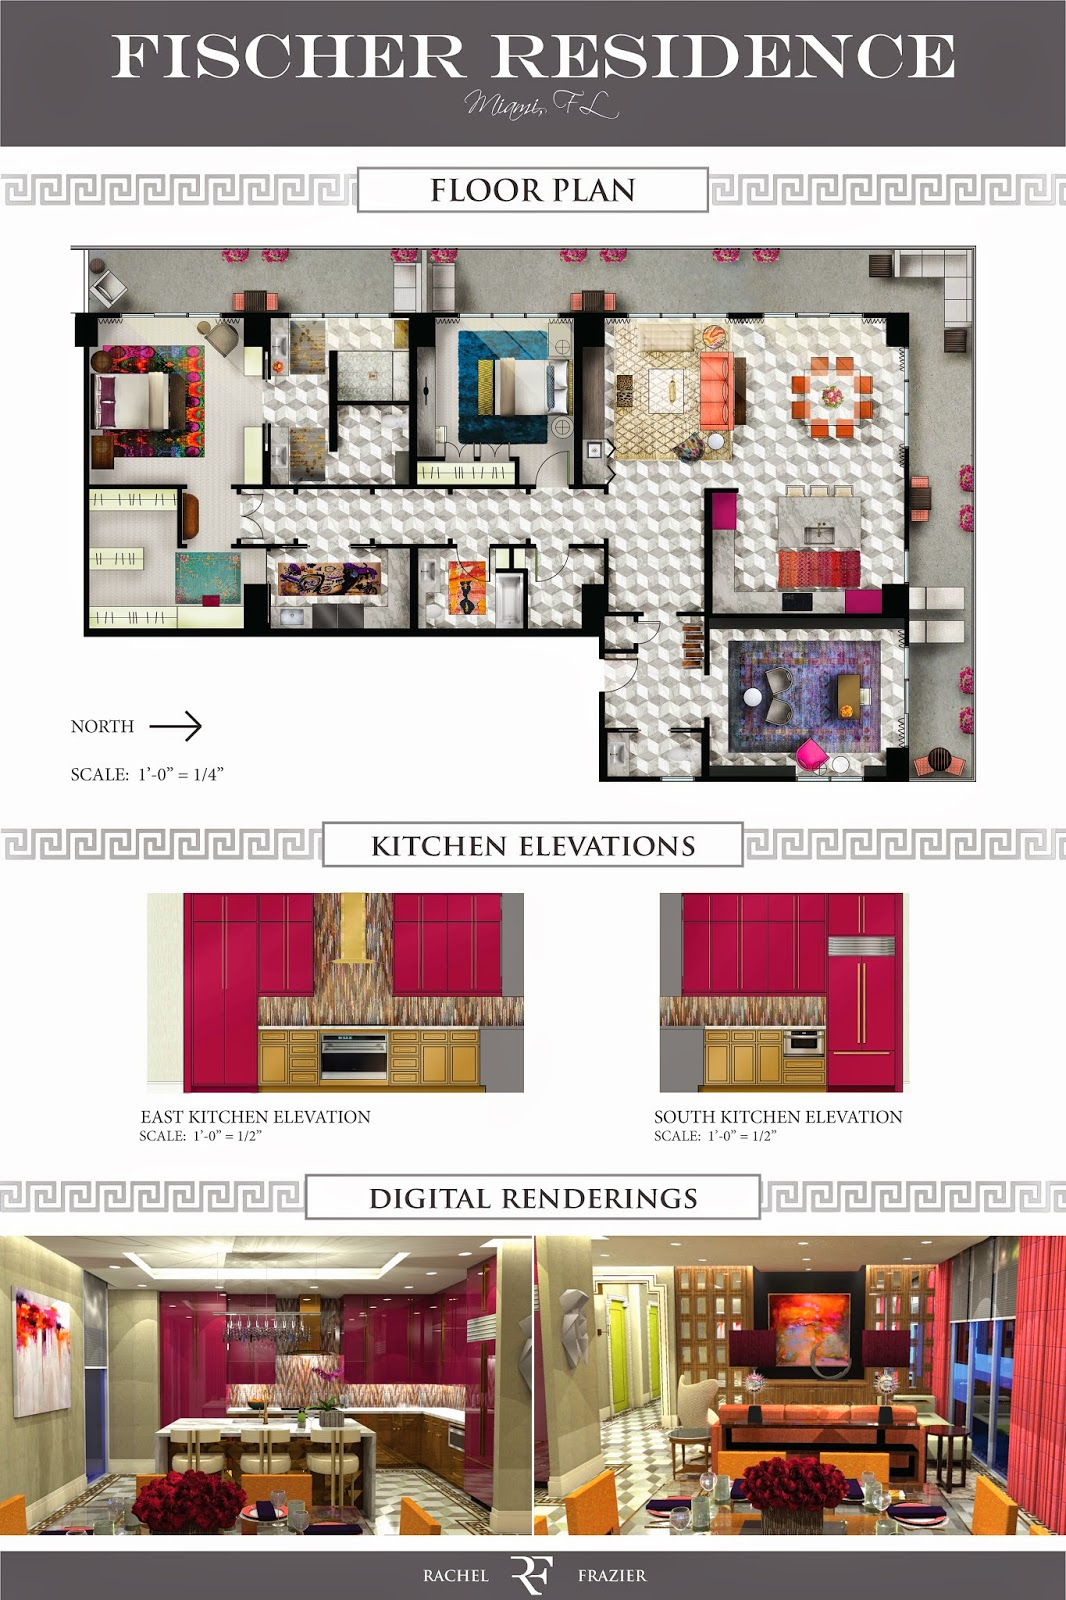 project on digital media pdf